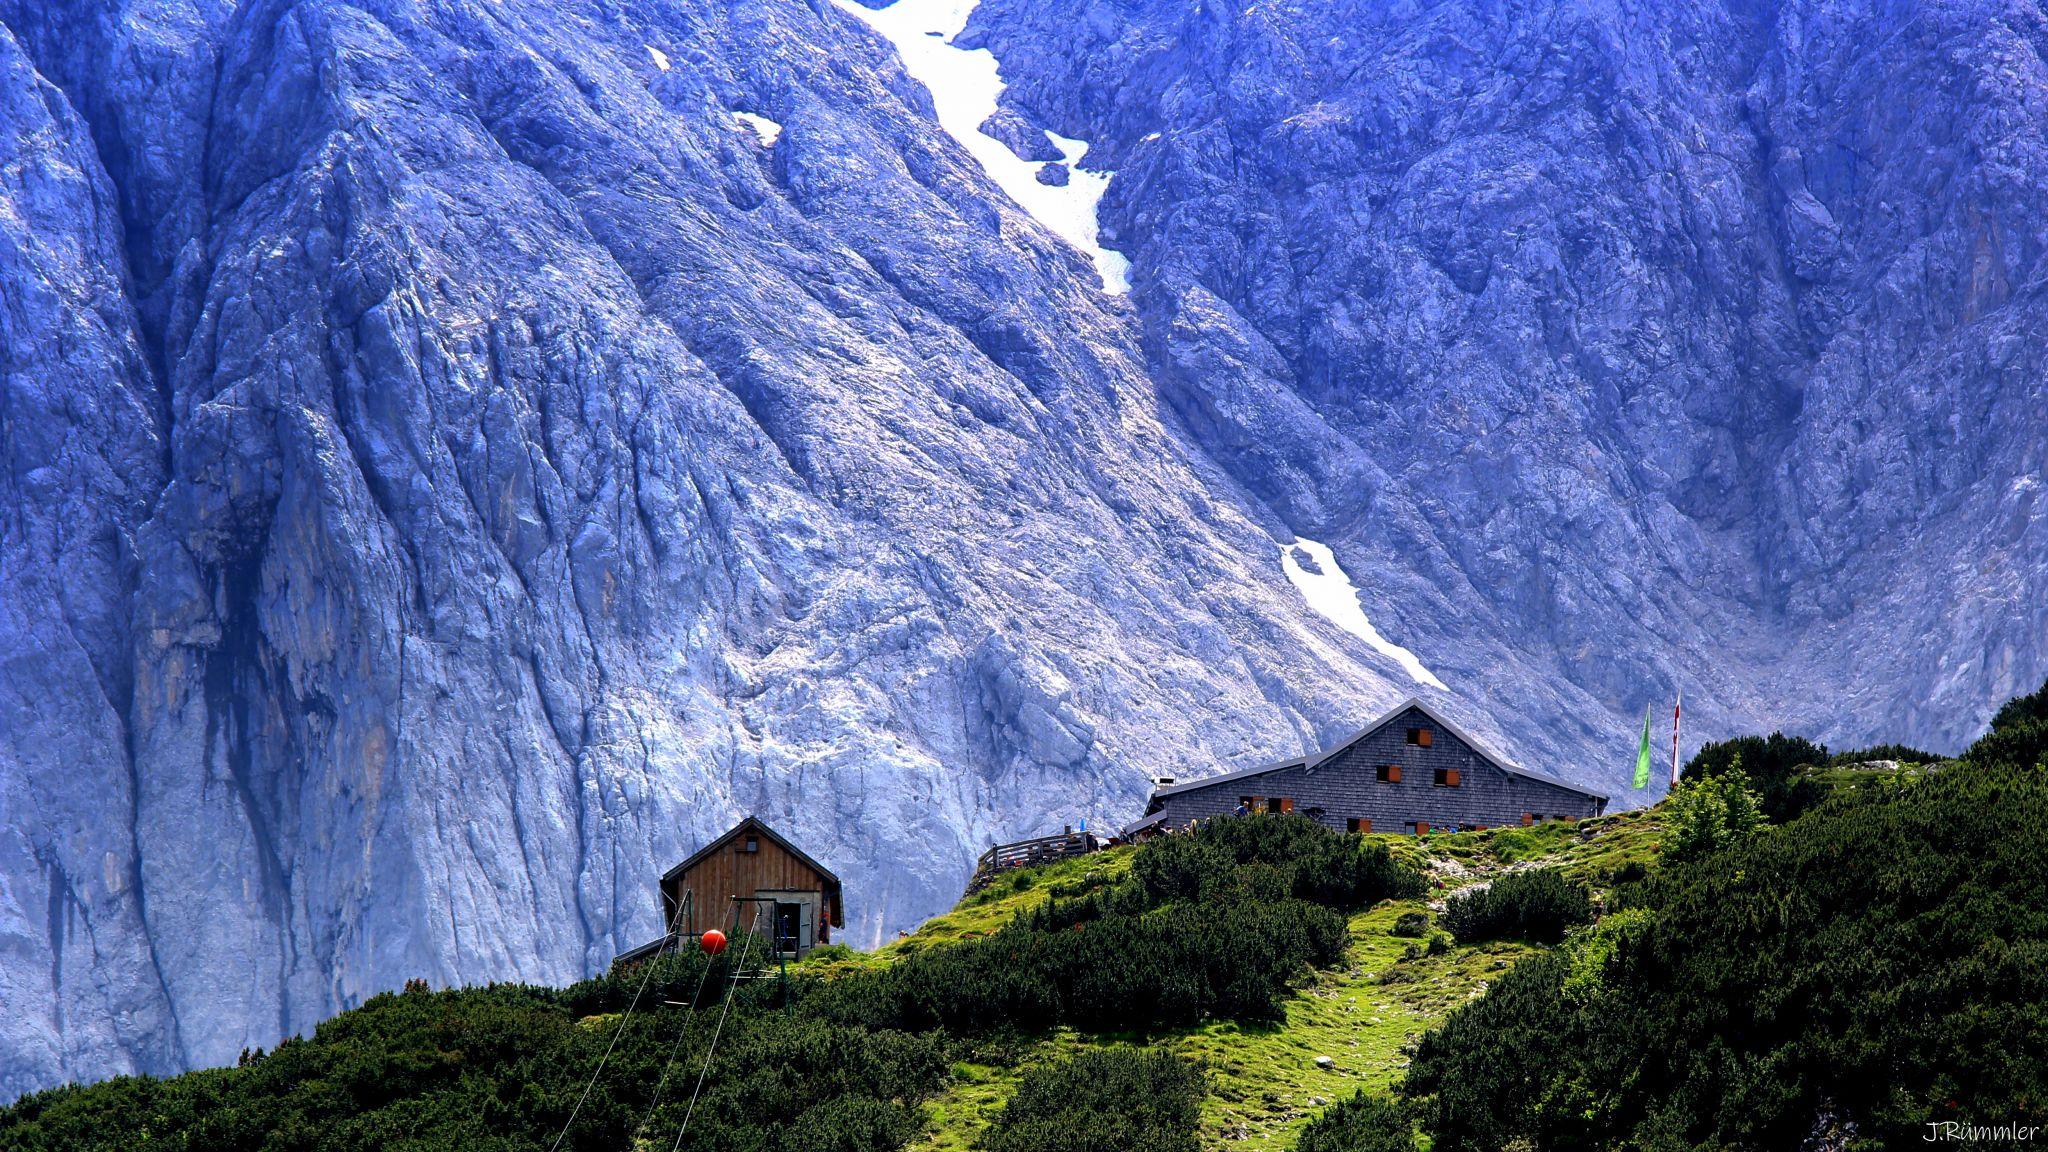 Coburger Hütte, Austria